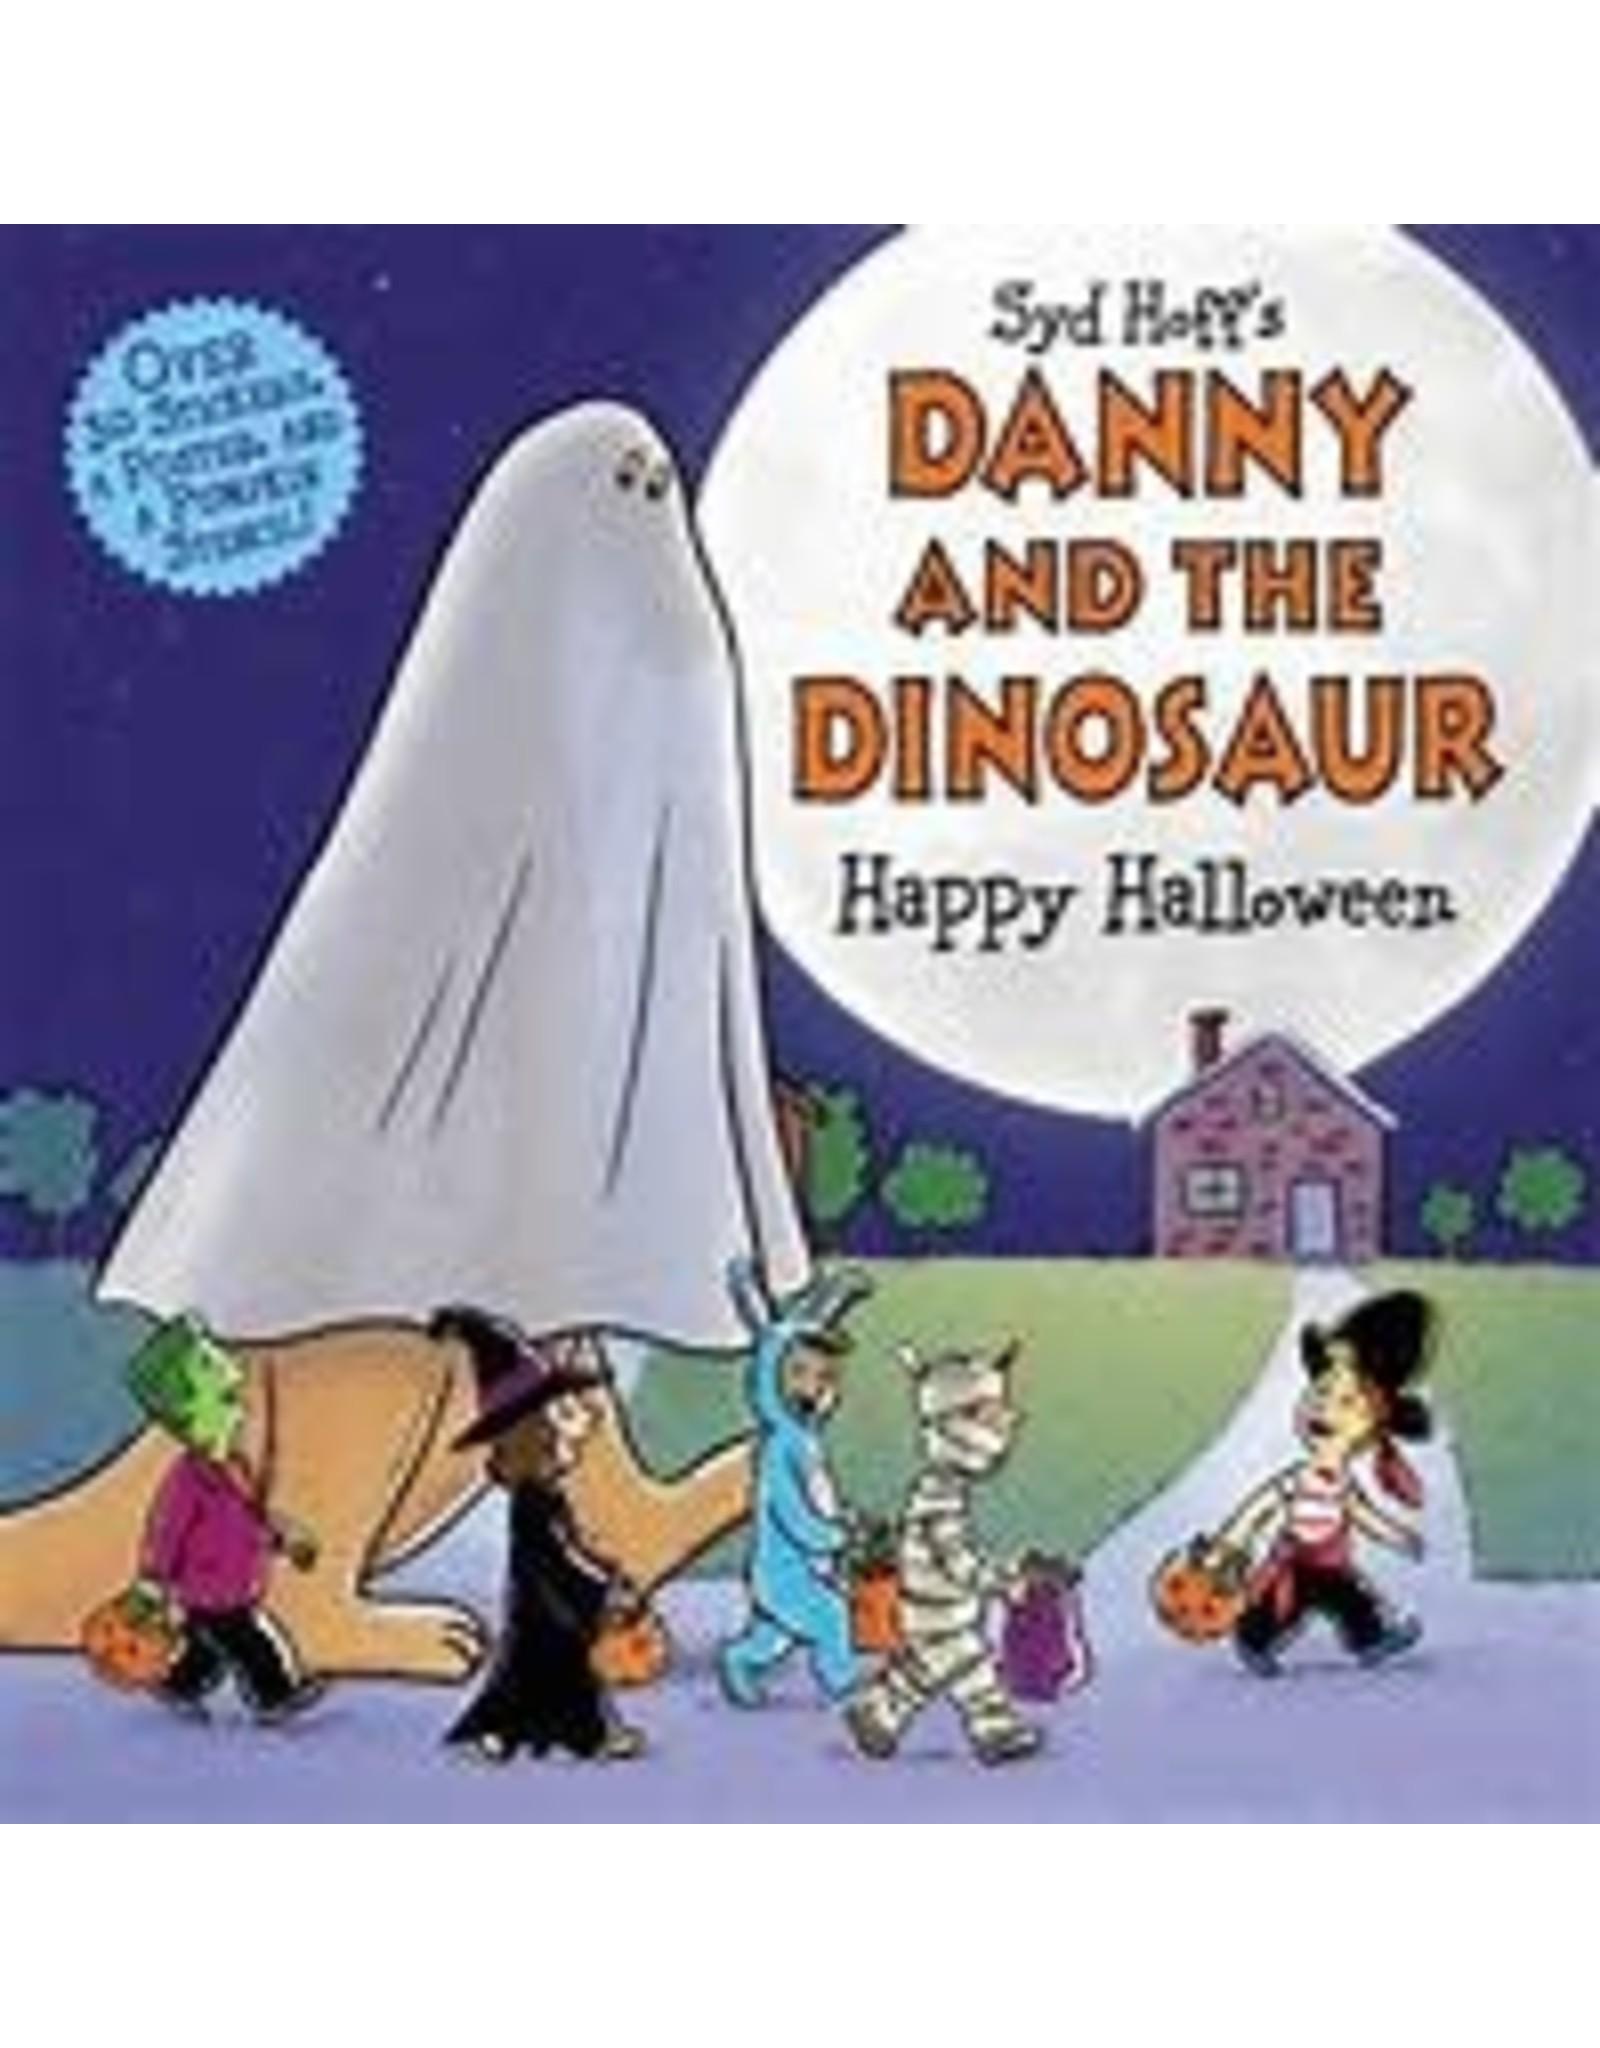 Happy Halloween Danny and the Dinosaur